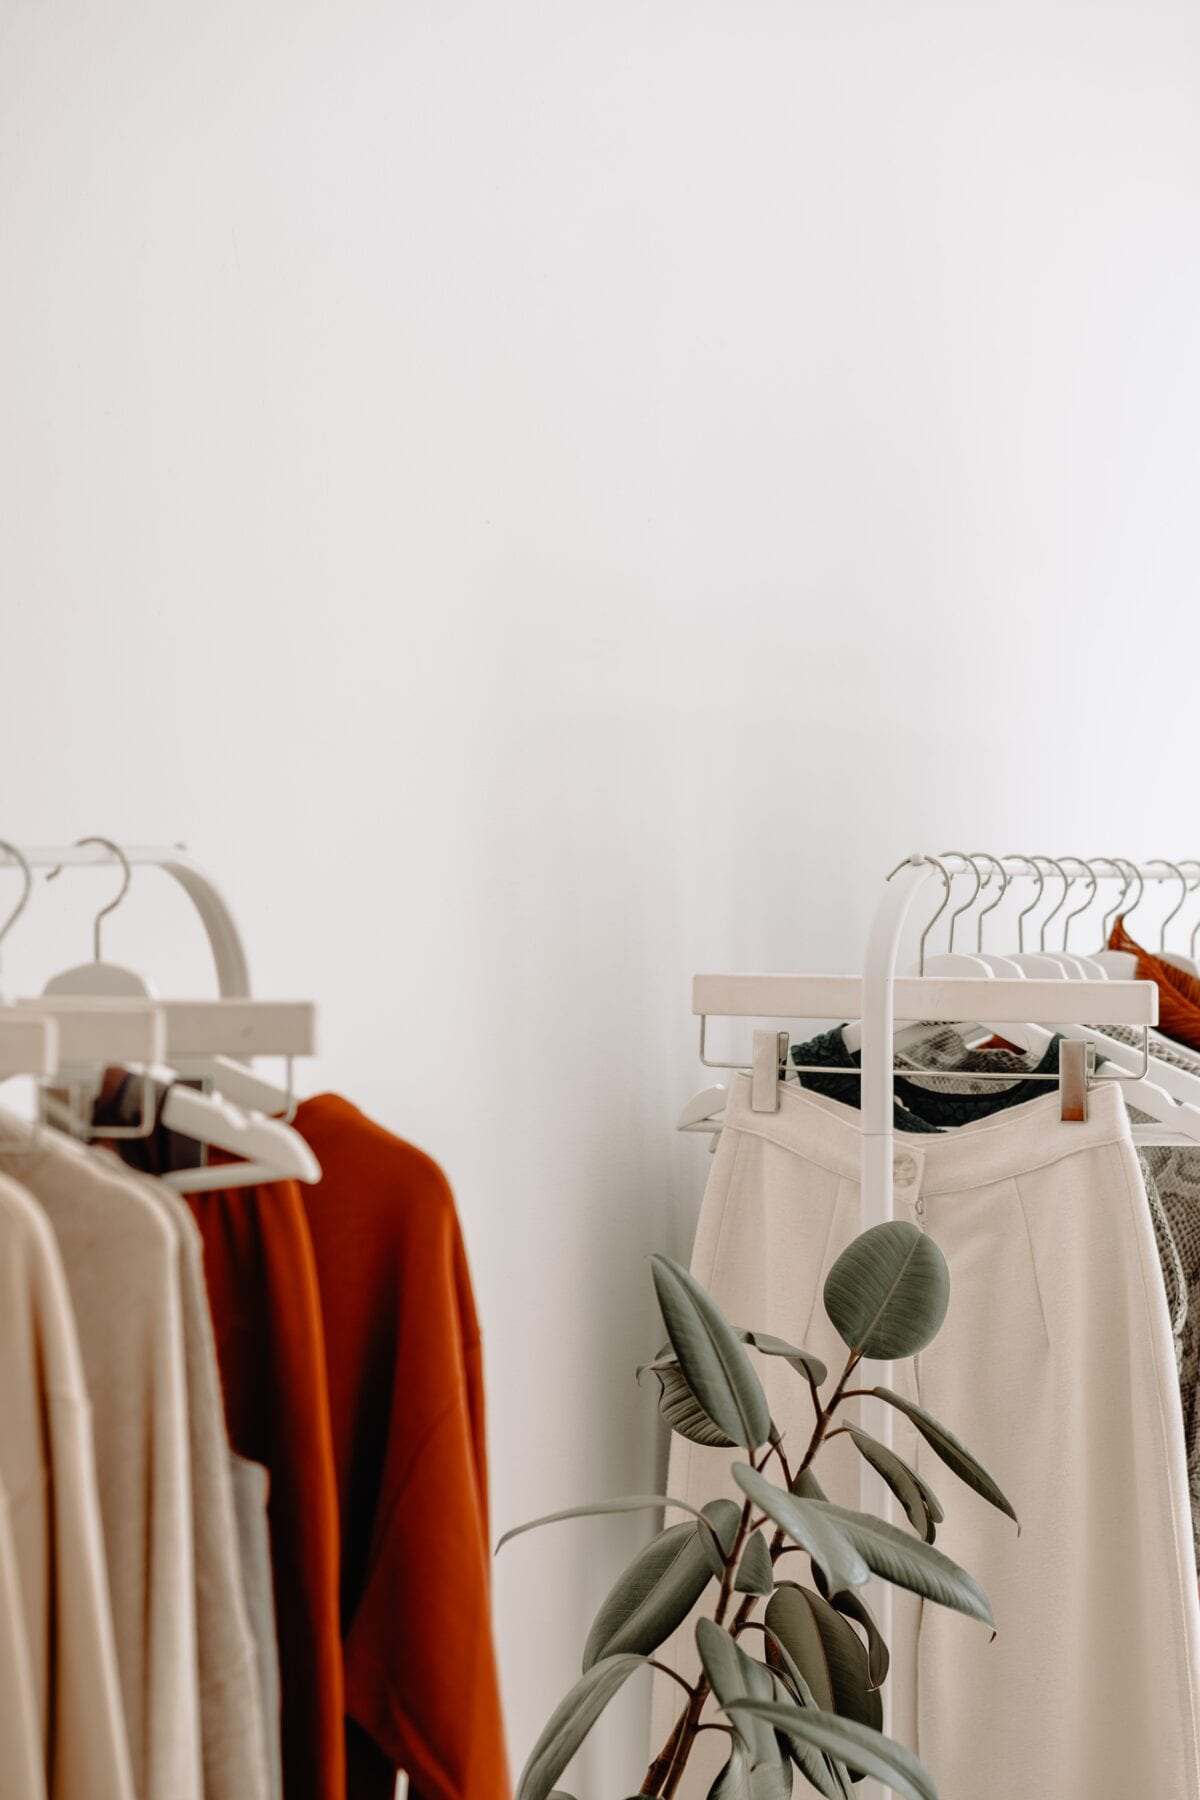 Fair trade kleding